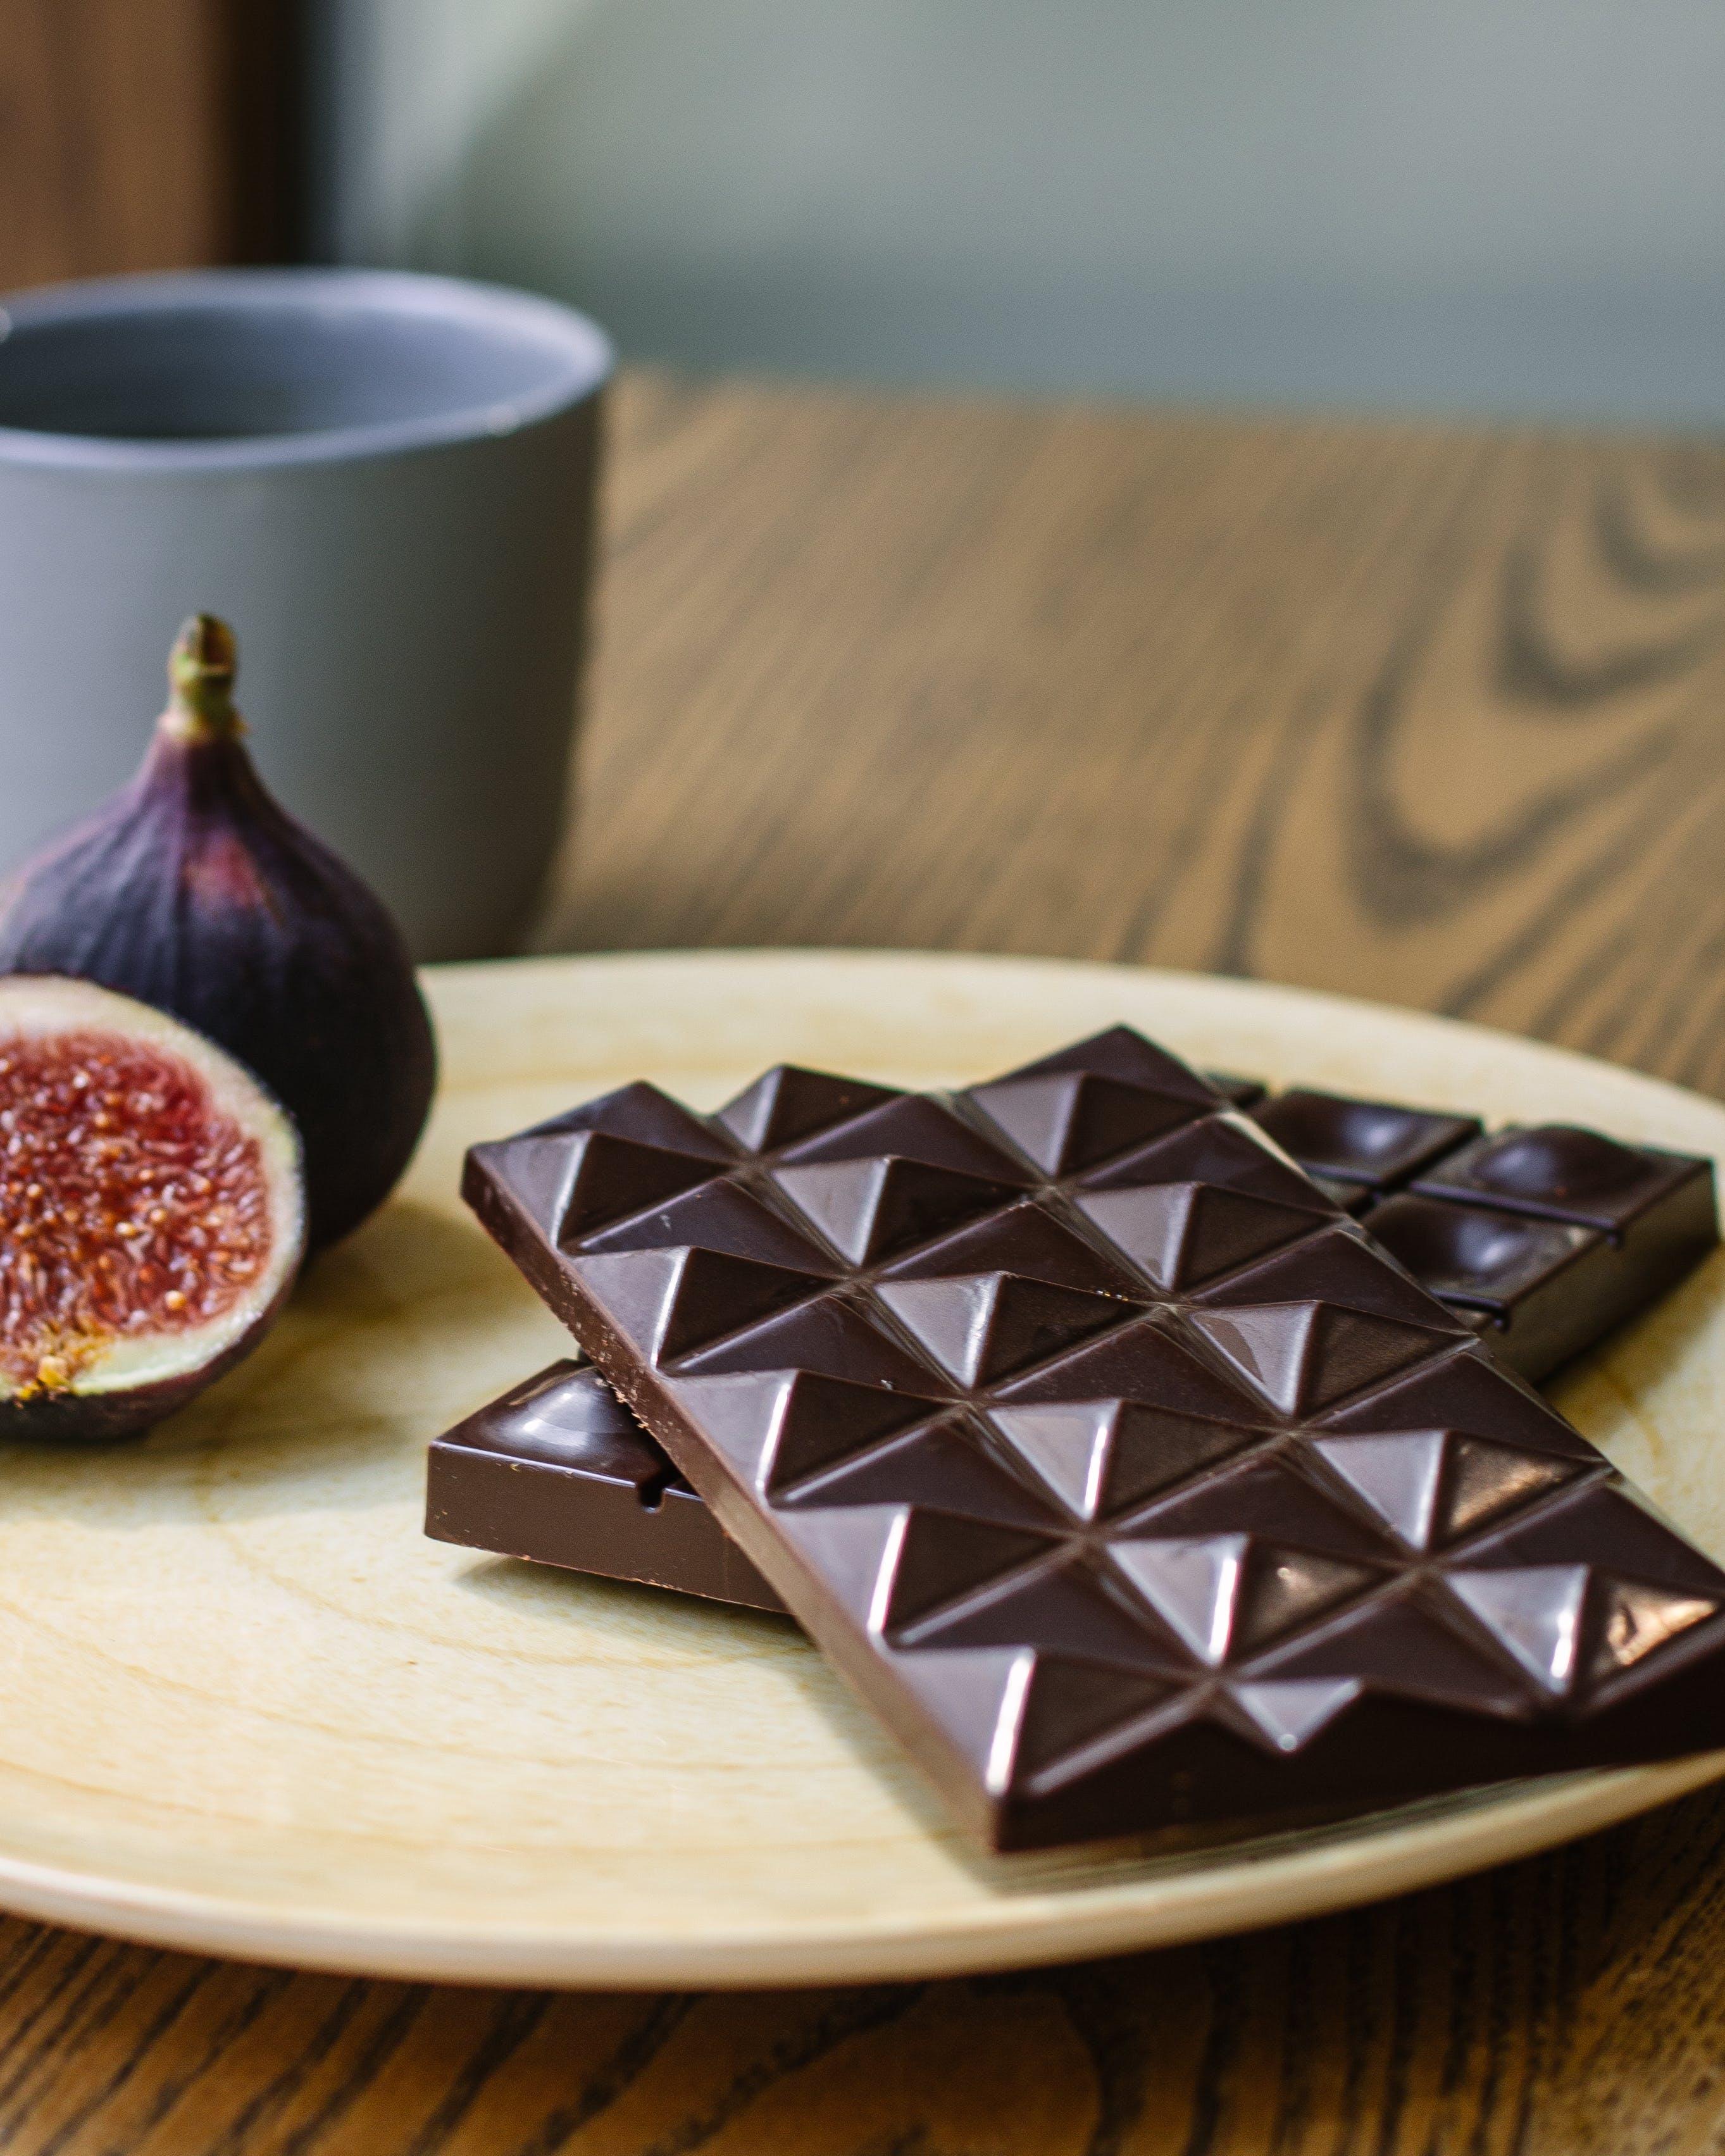 Gratis lagerfoto af Bordservice, chokolade, chokoladebar, delikat